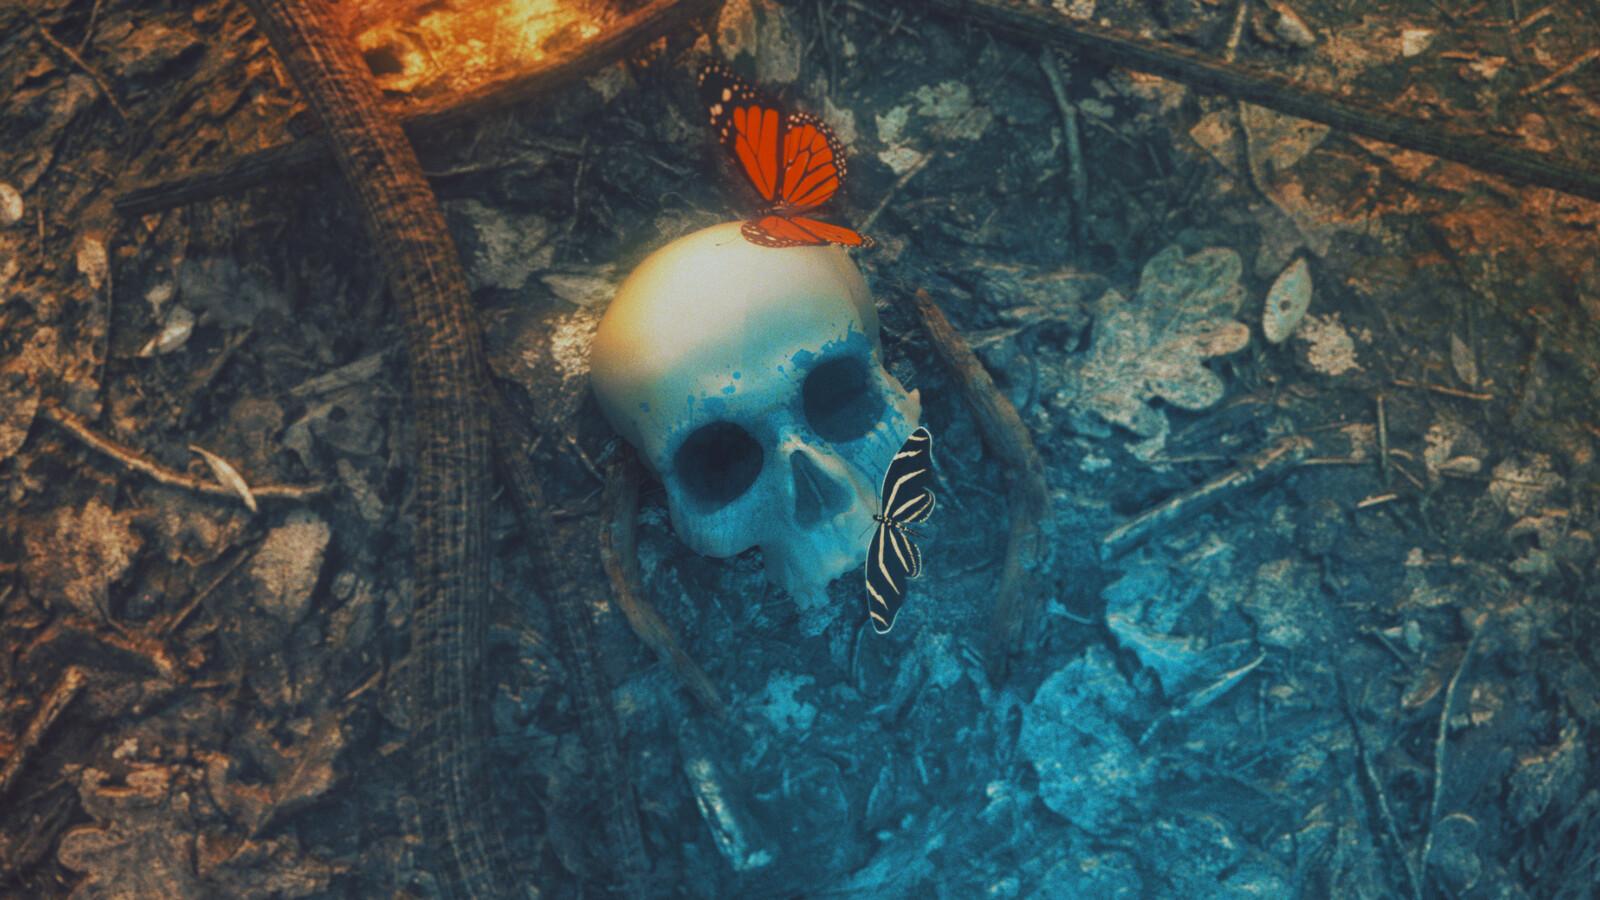 Skull in the woods